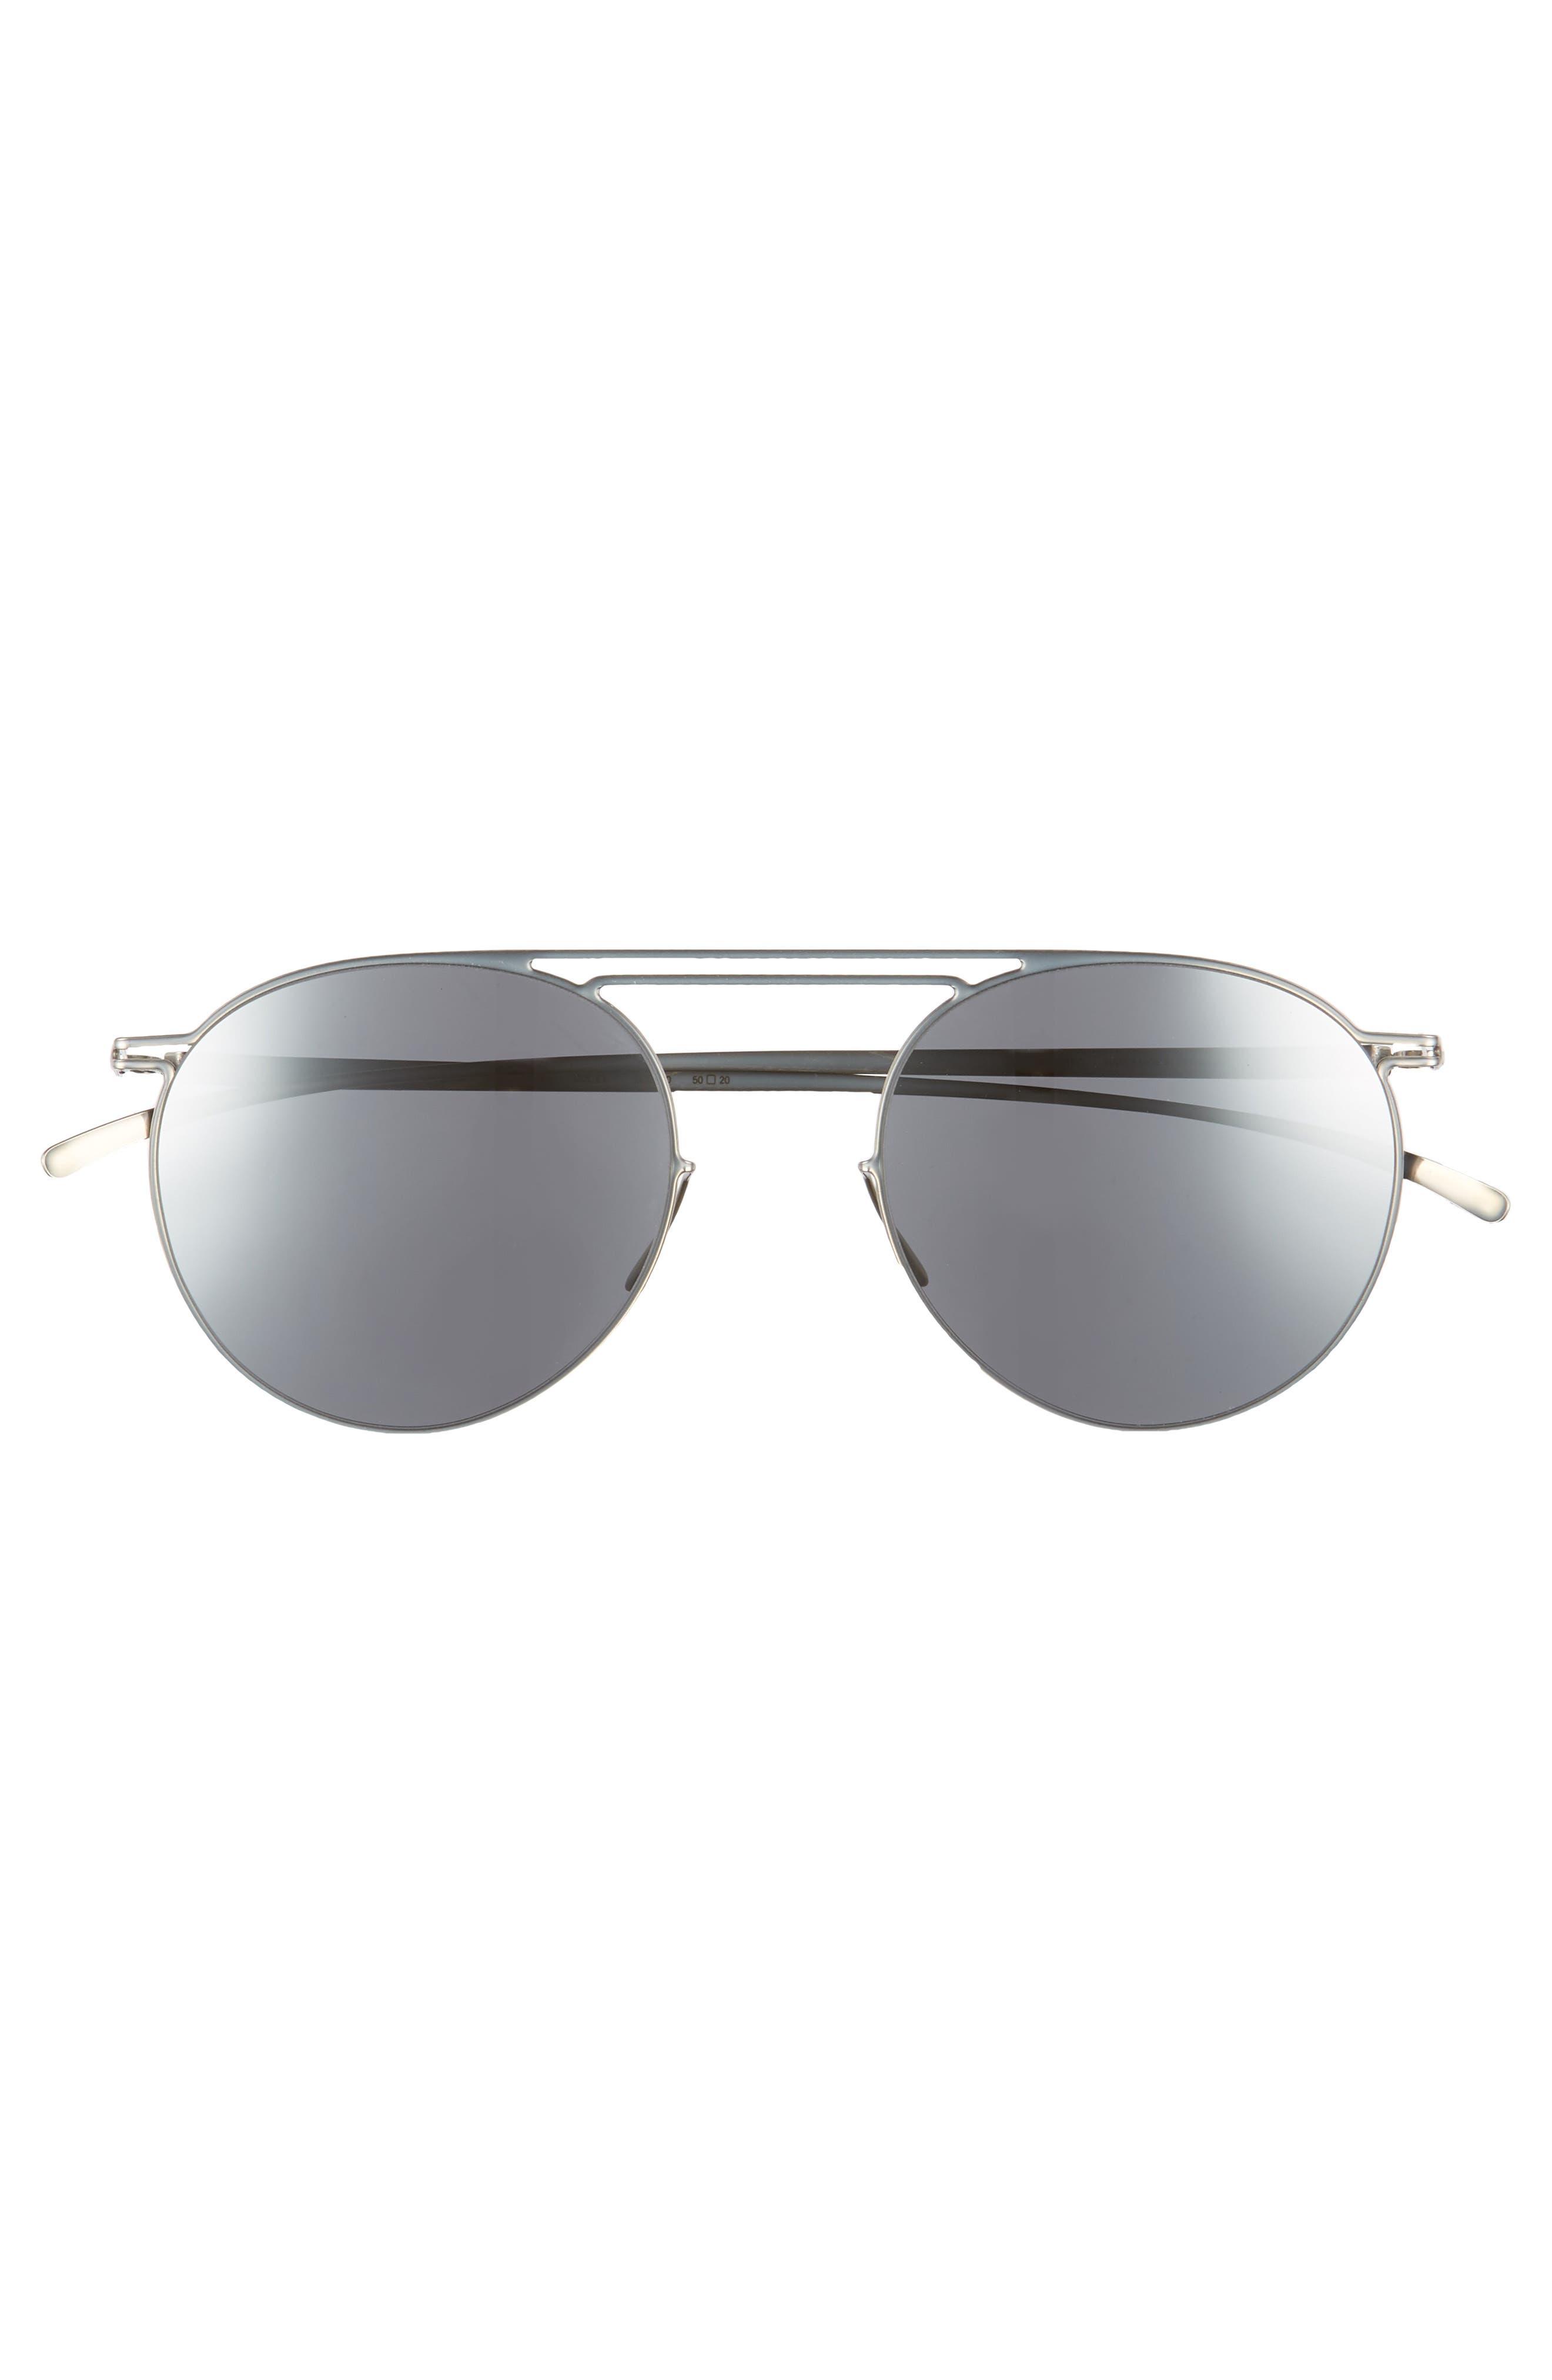 MMESSE009 50mm Sunglasses,                             Alternate thumbnail 4, color,